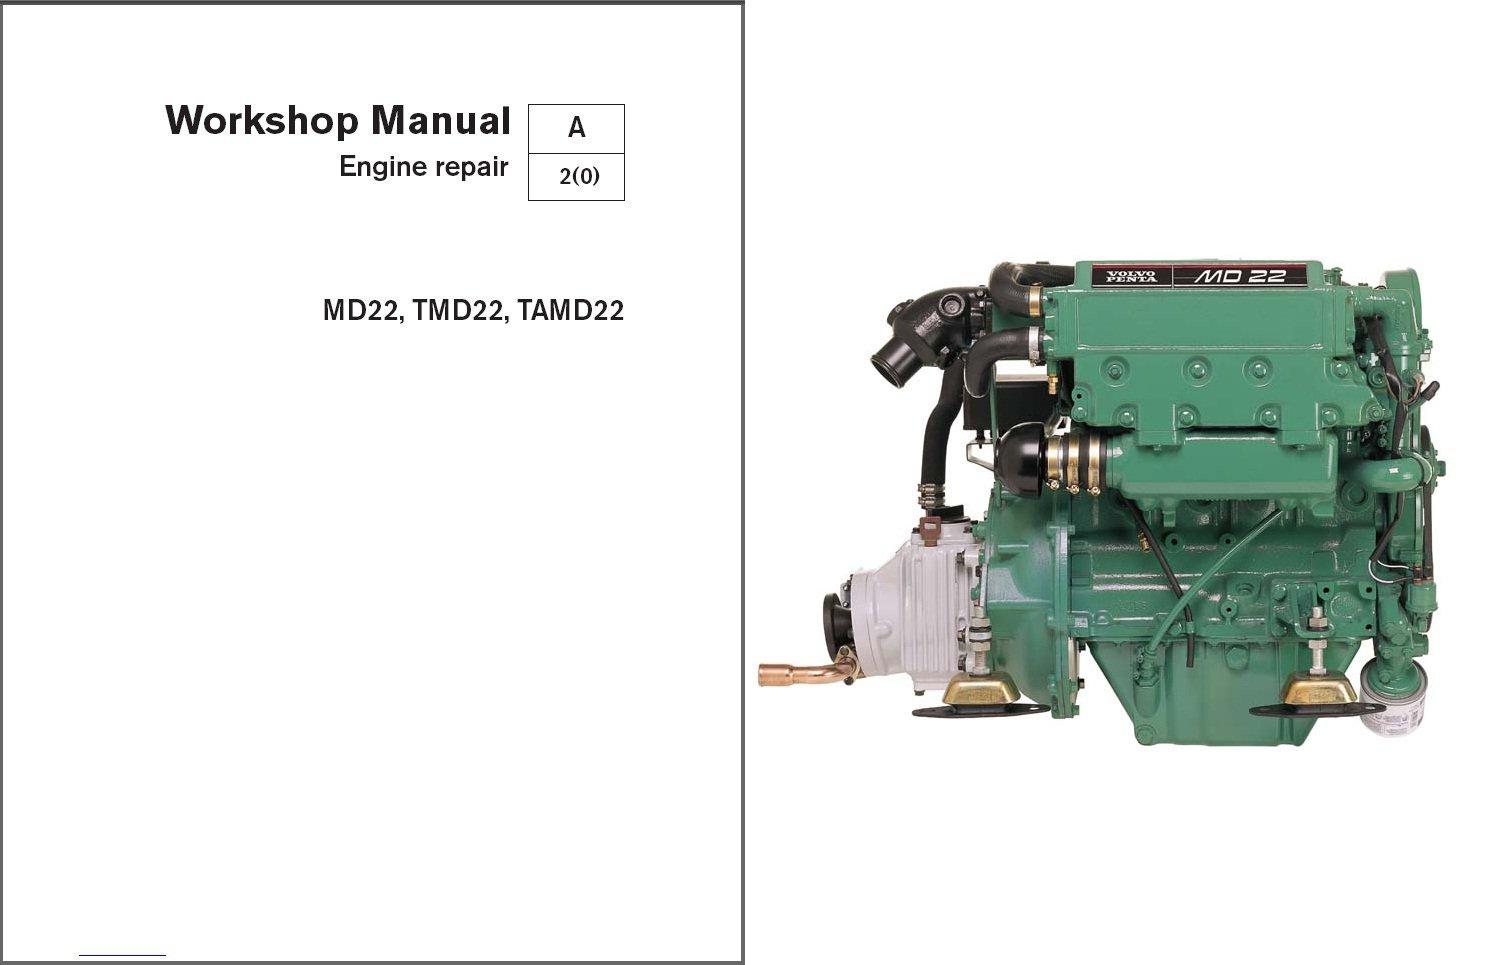 Volvo Penta Md22 Wiring Diagram Most Uptodate Info 1996 Starter Simple Site Rh 5 19 2 Ohnevergnuegen De Trim